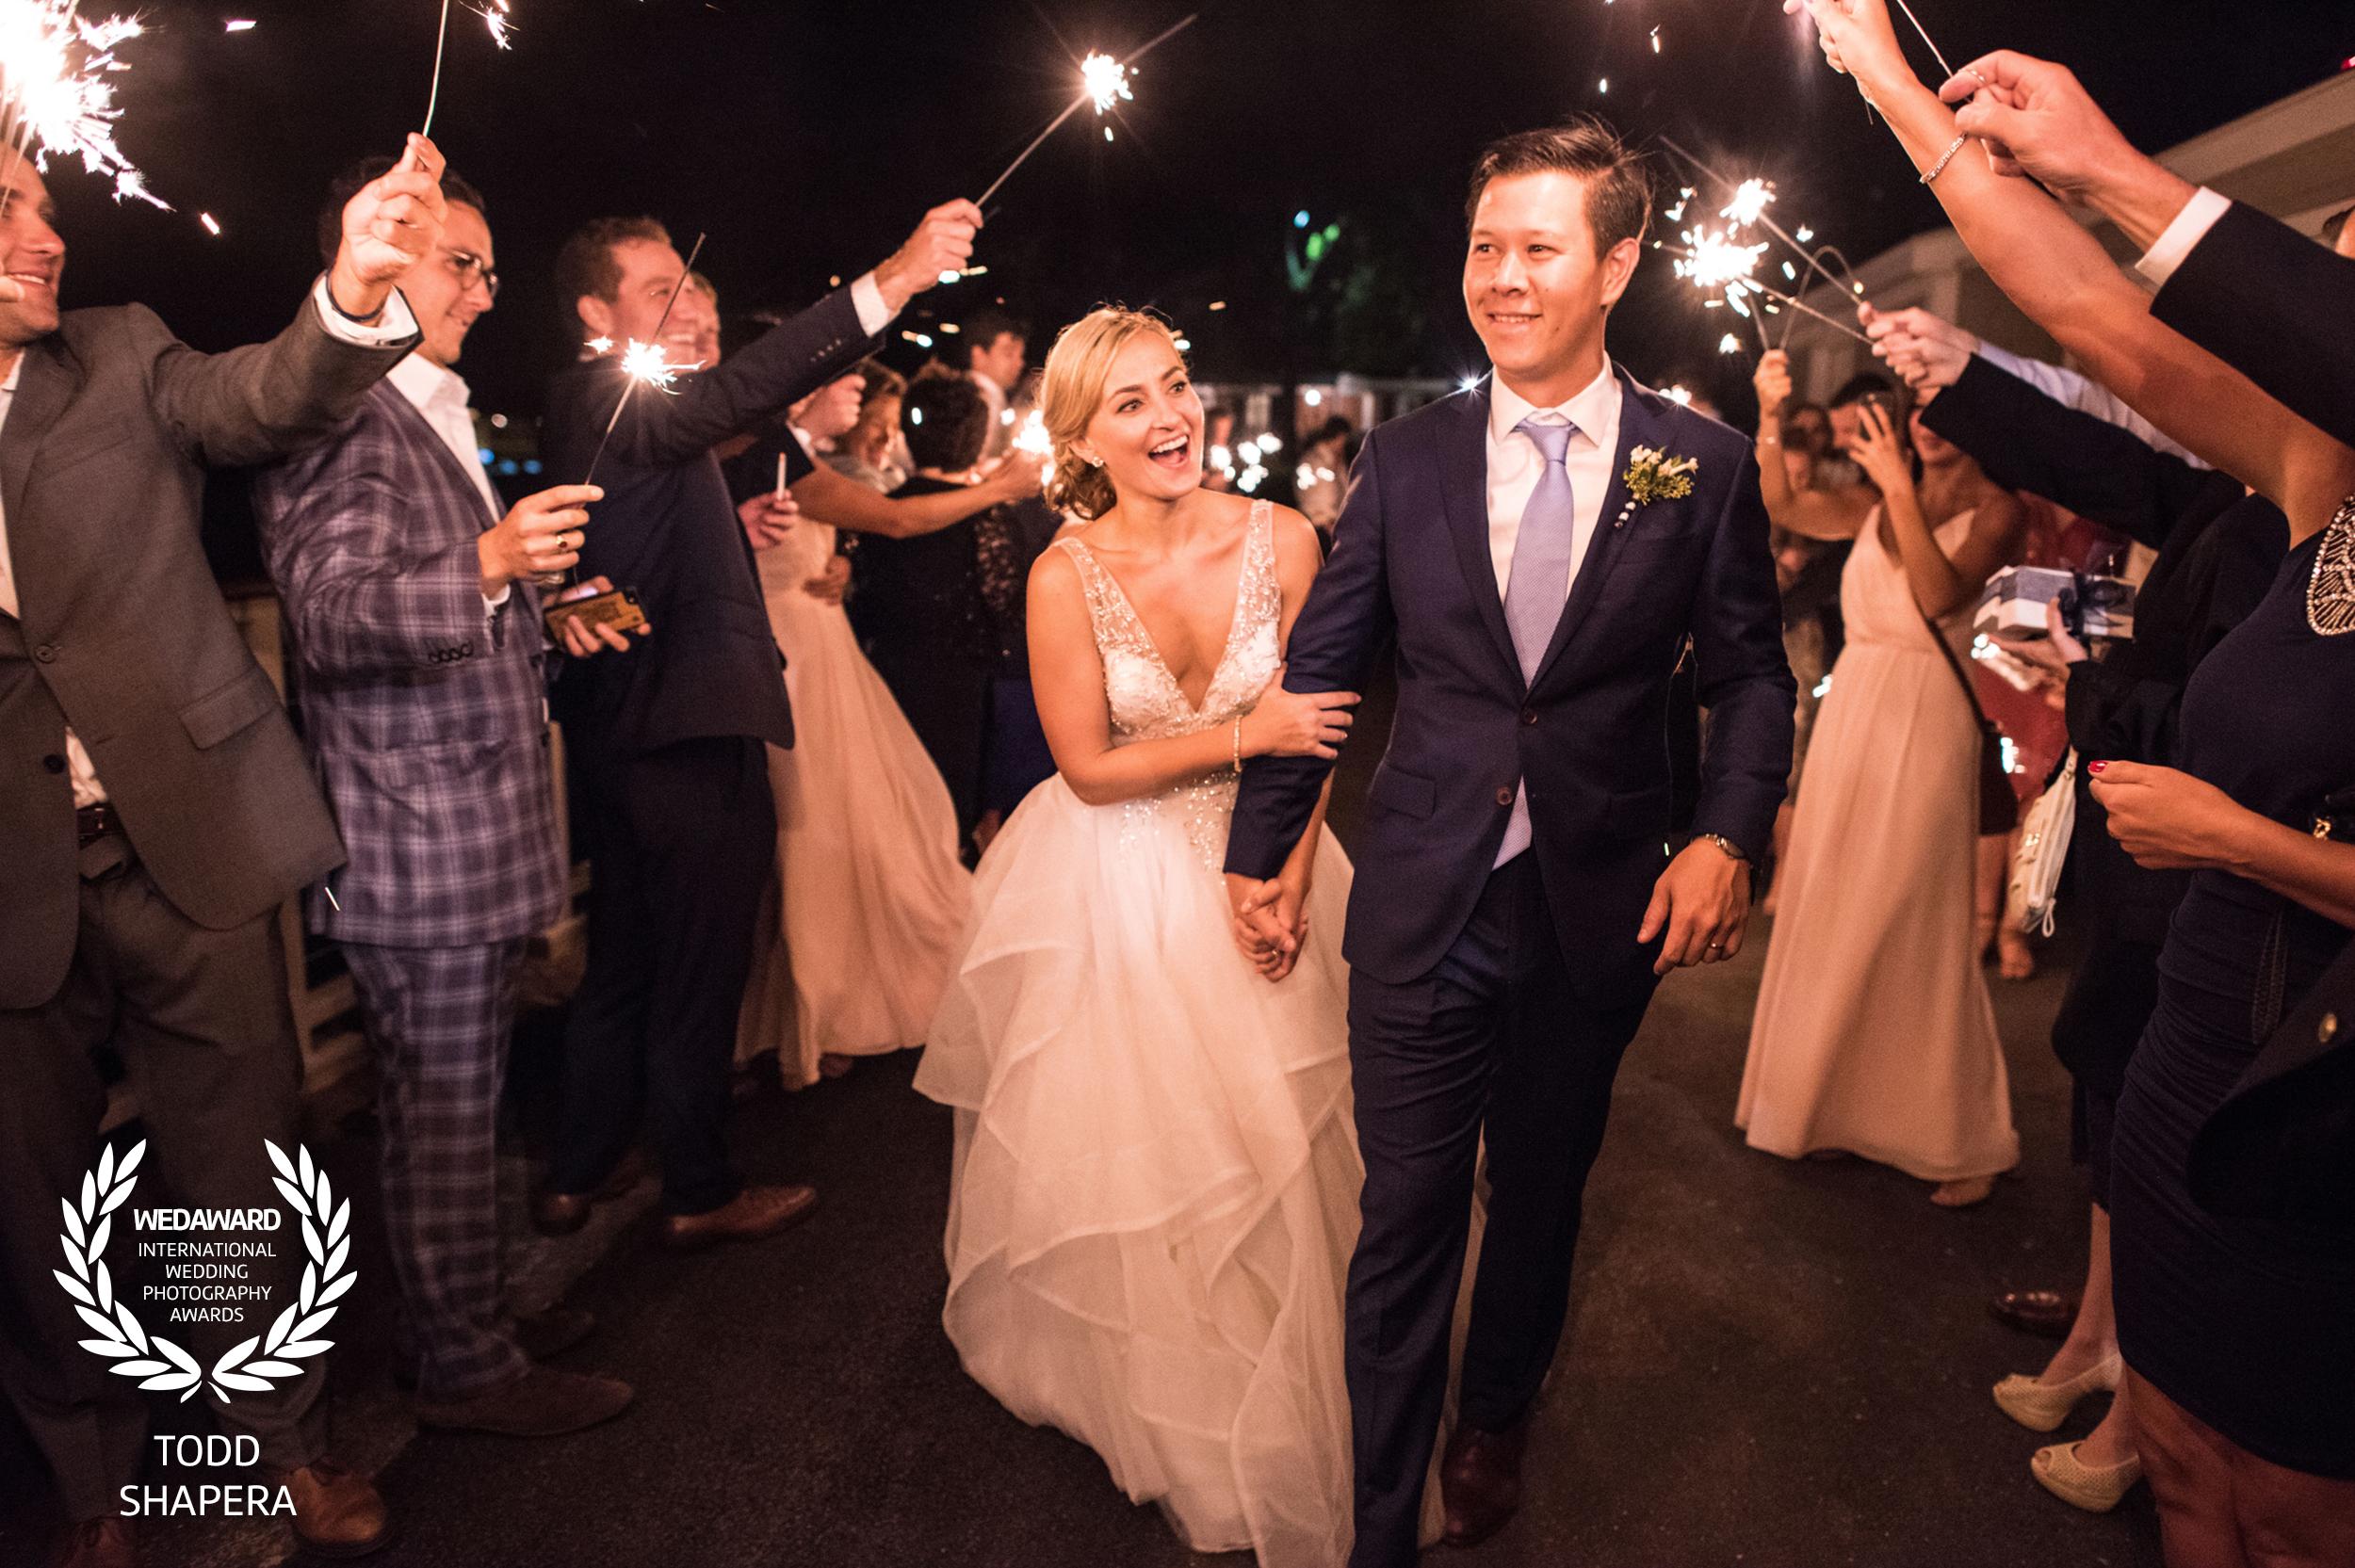 Wedding Reception - Newlywed's Sparkler Send Off